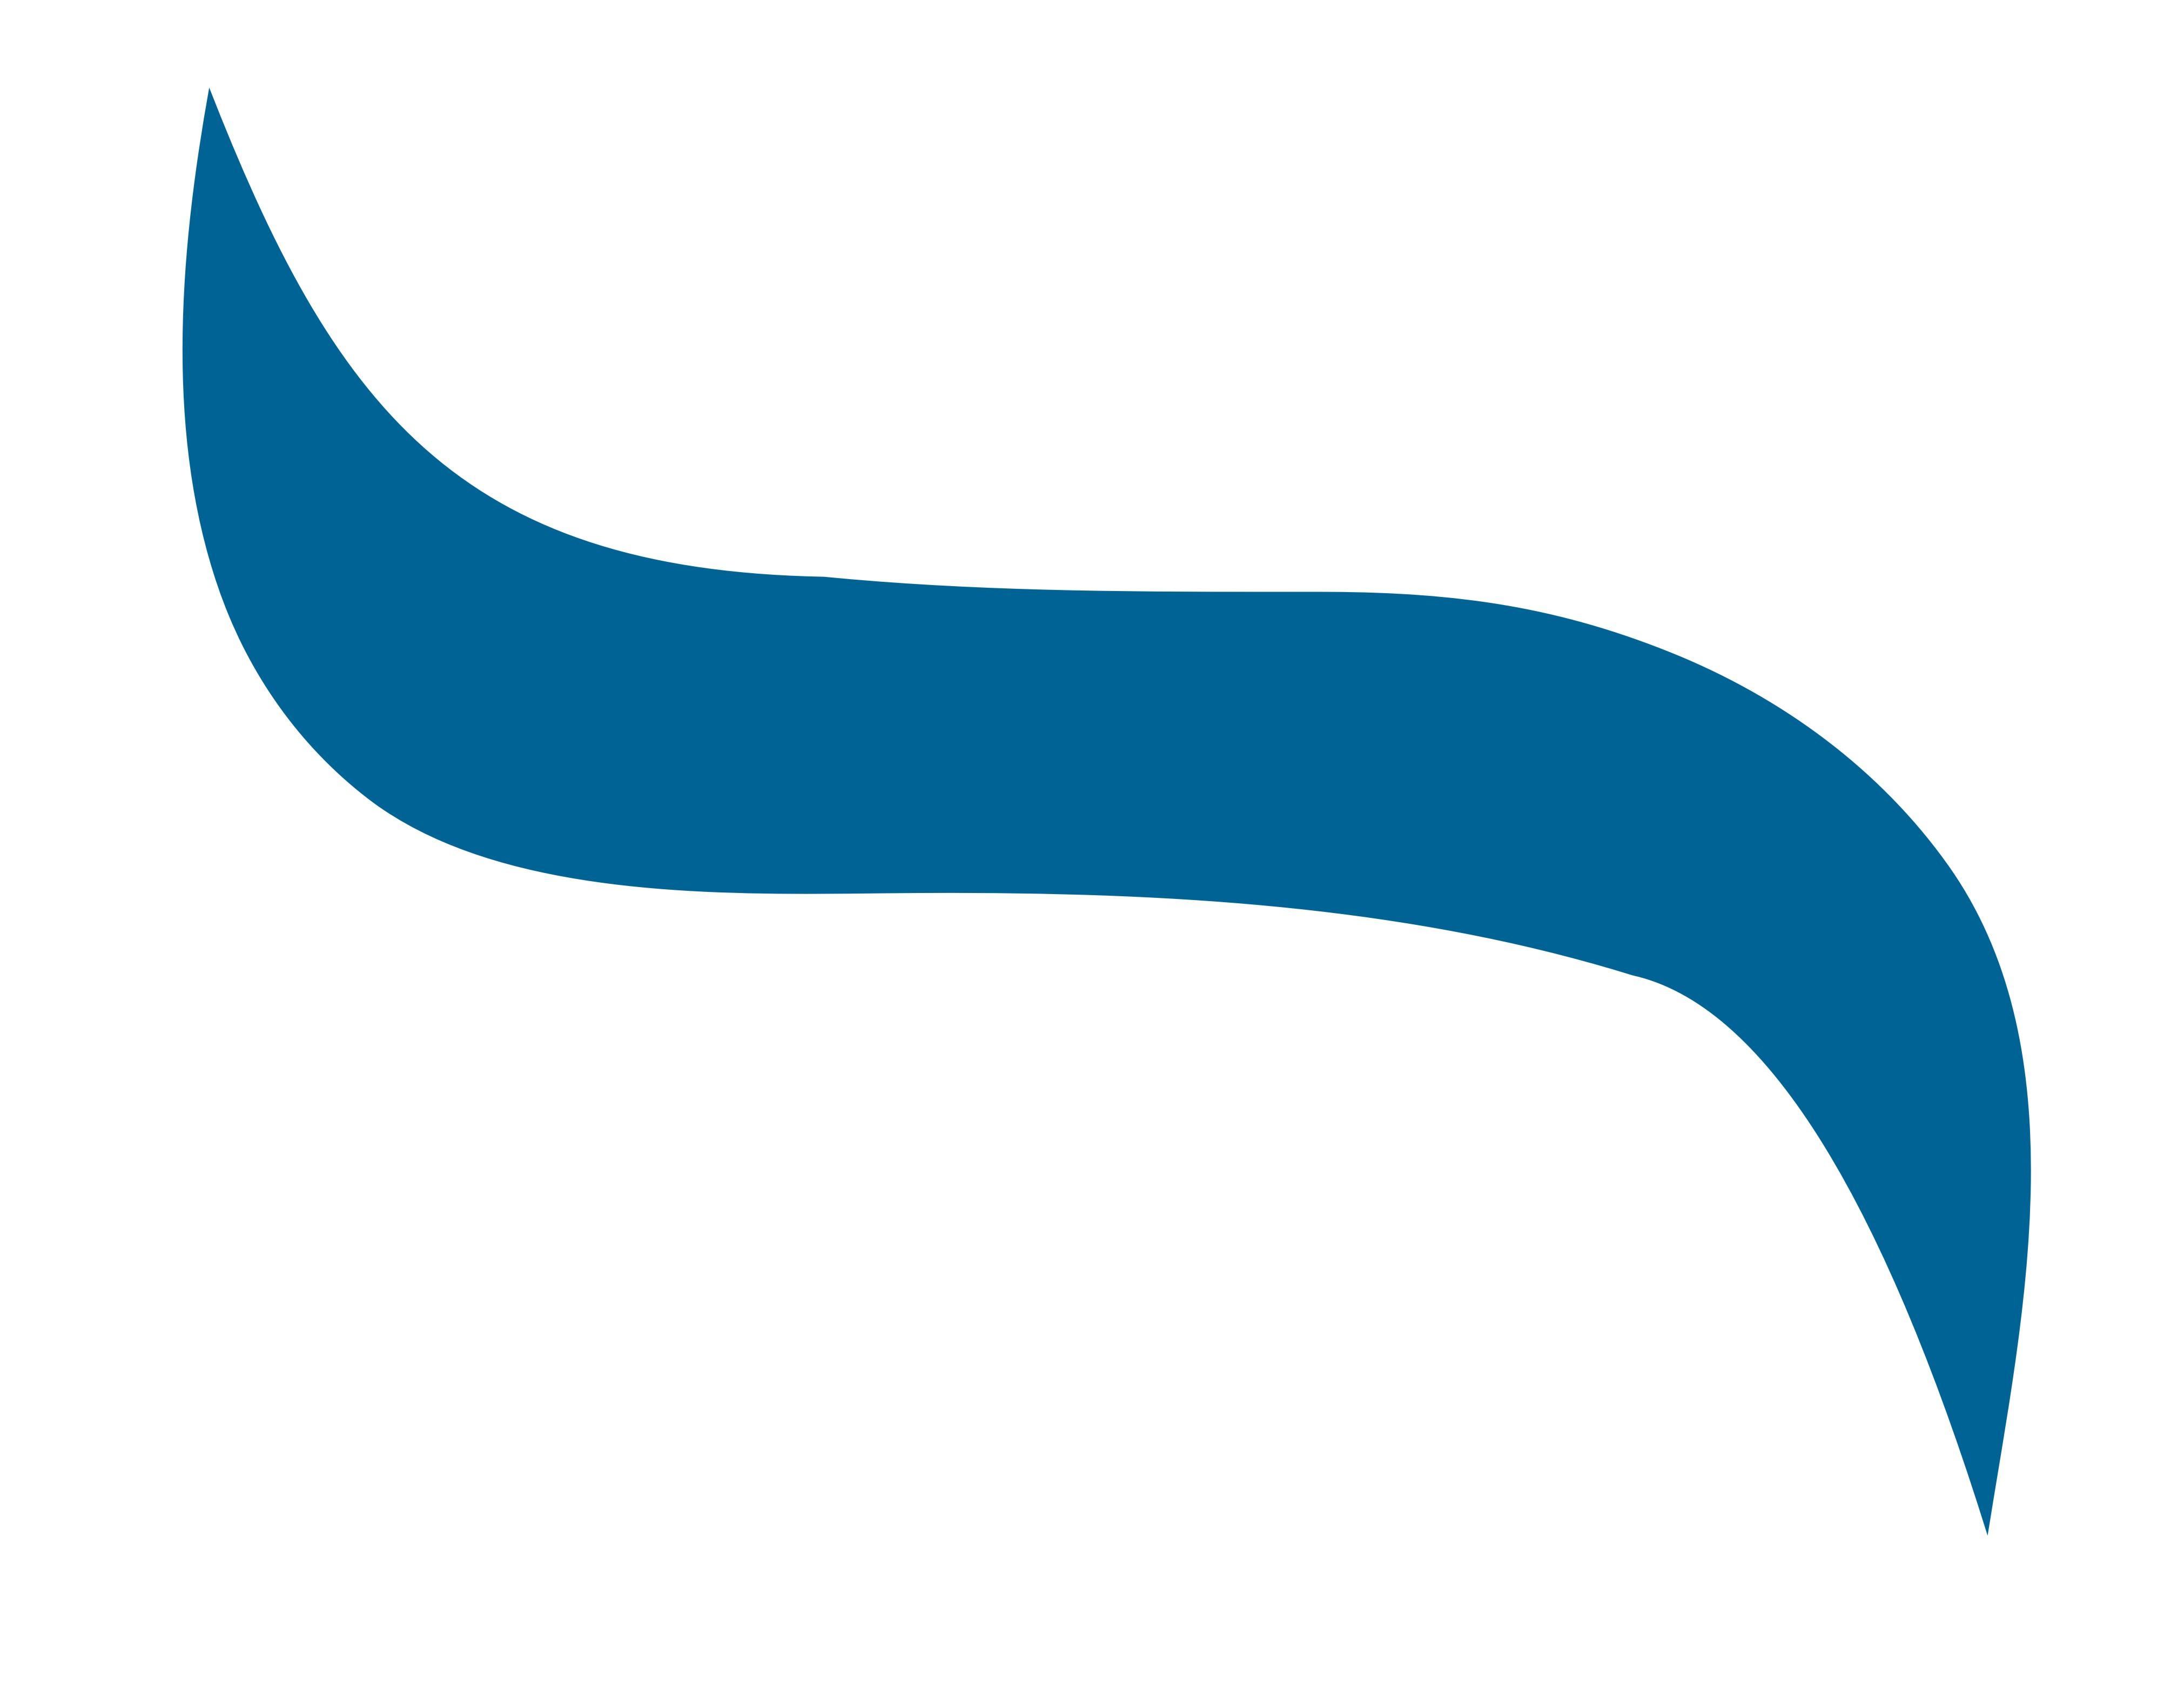 Bases de convocatoria a diseño de afiche Bordes